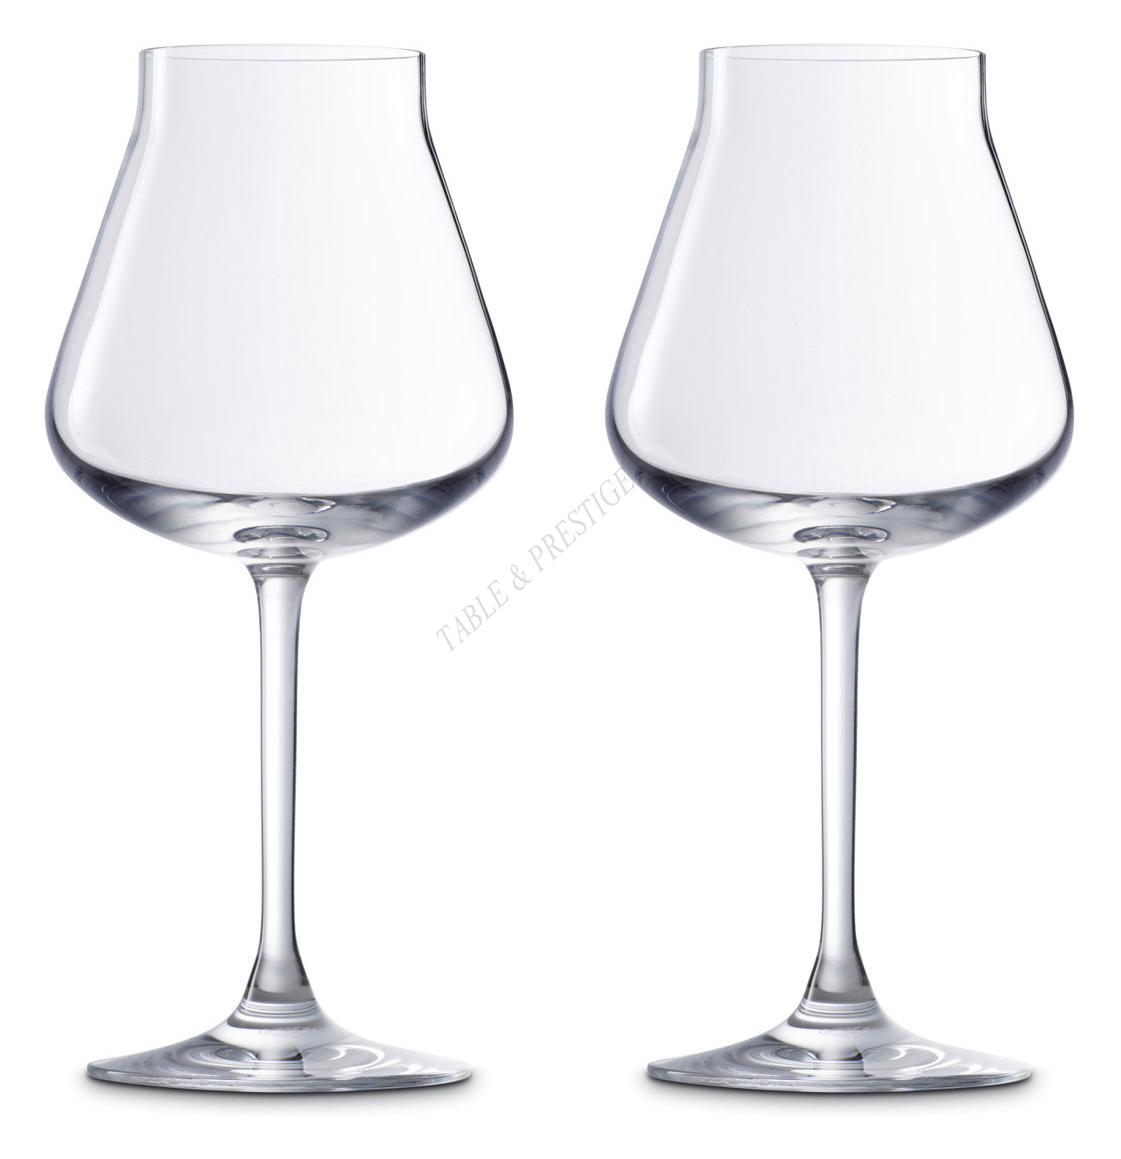 wine glass baccarat chateau baccarat 2612045. Black Bedroom Furniture Sets. Home Design Ideas